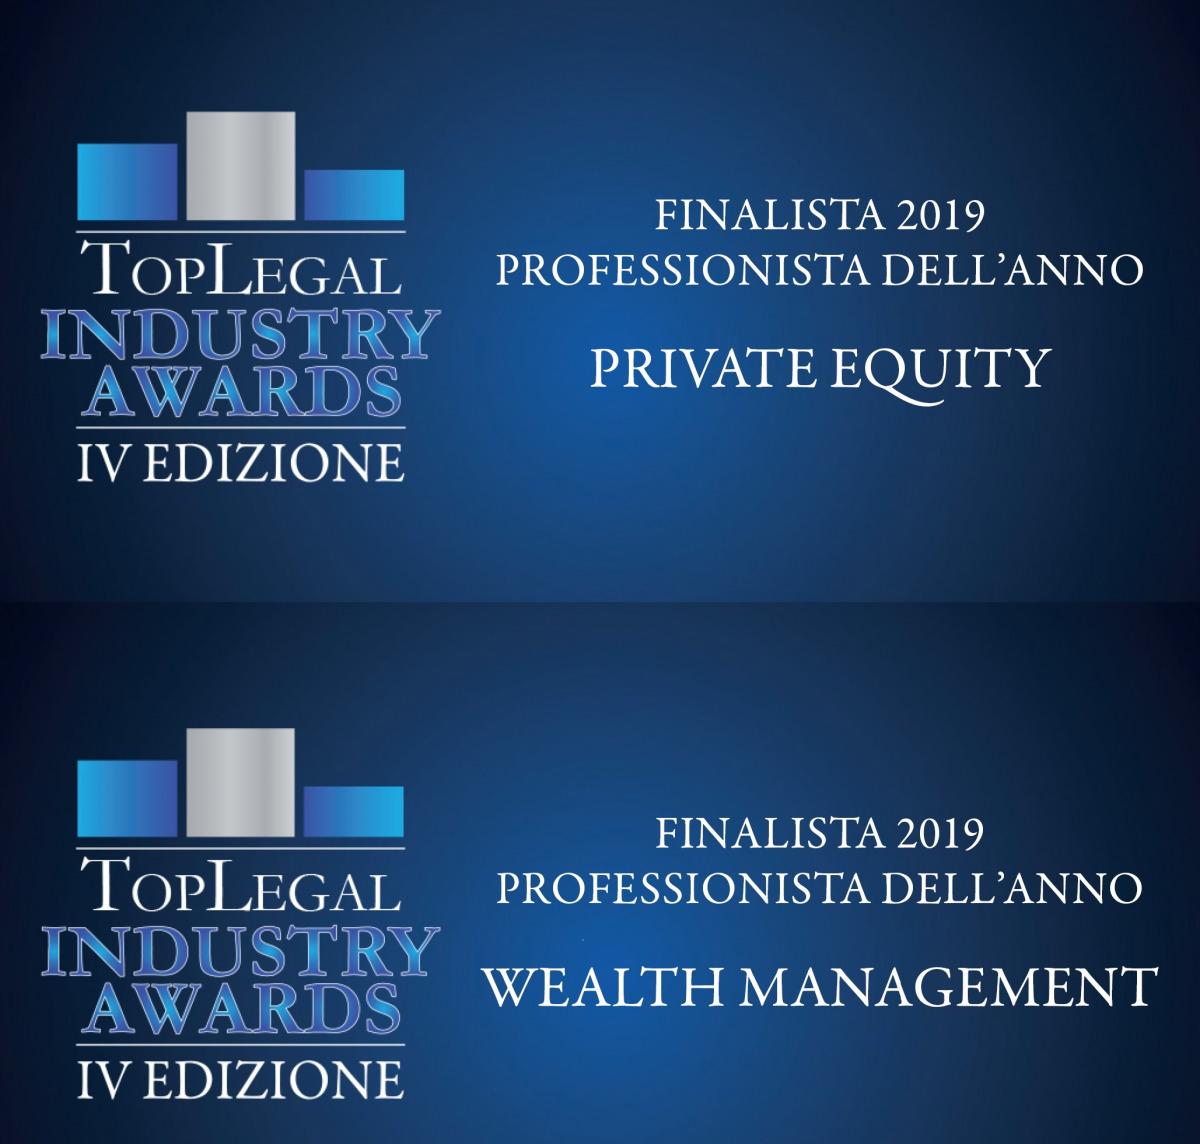 Leo De Rosa nominee at Top Legal Industry Awards 2019